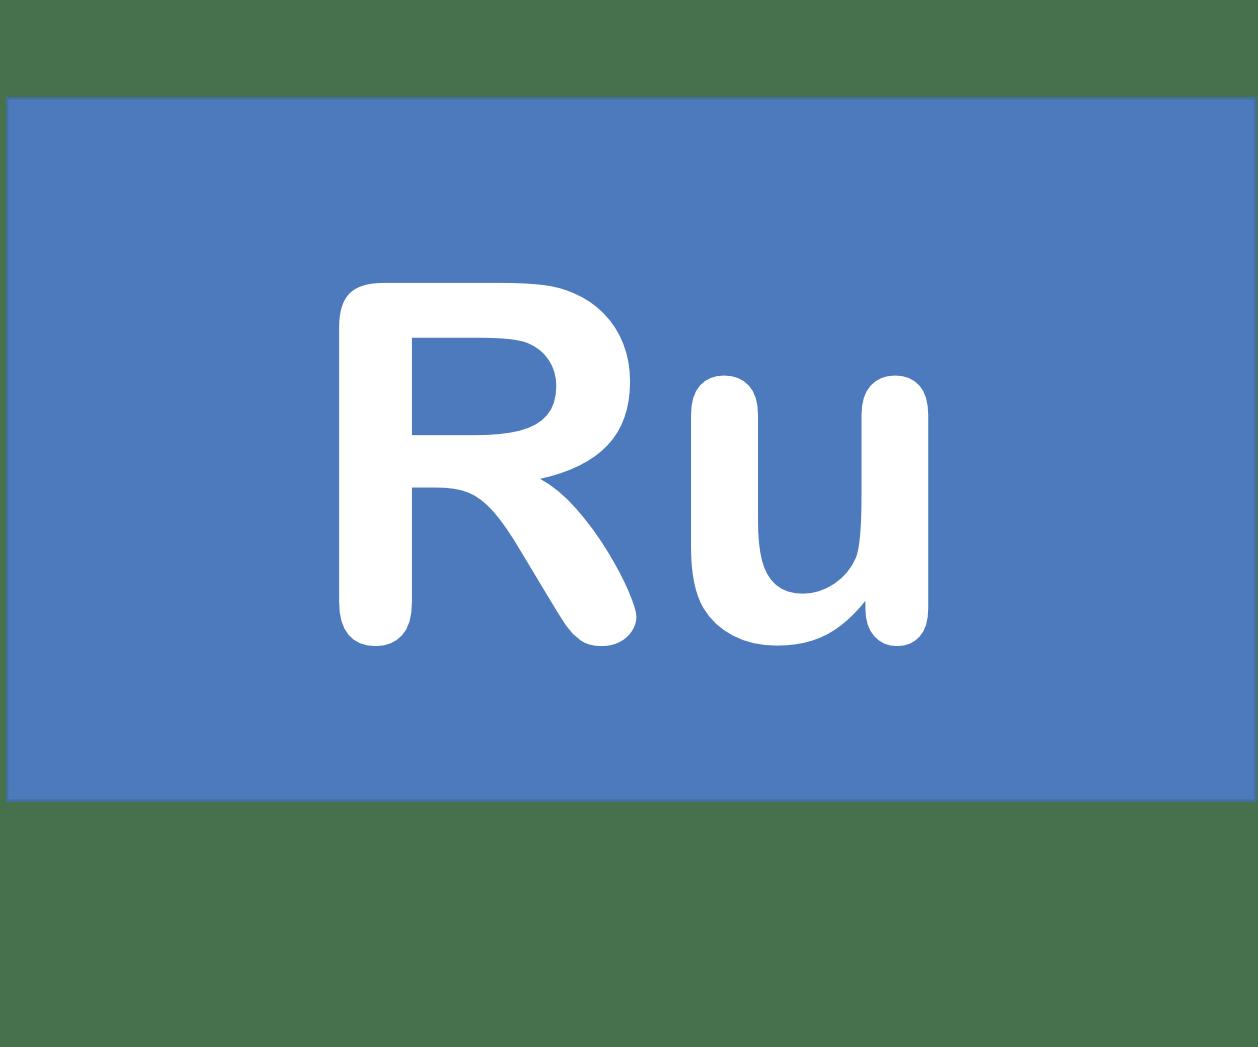 44 Ru ルテニウム Ruthenium 元素 記号 周期表 化学 原子